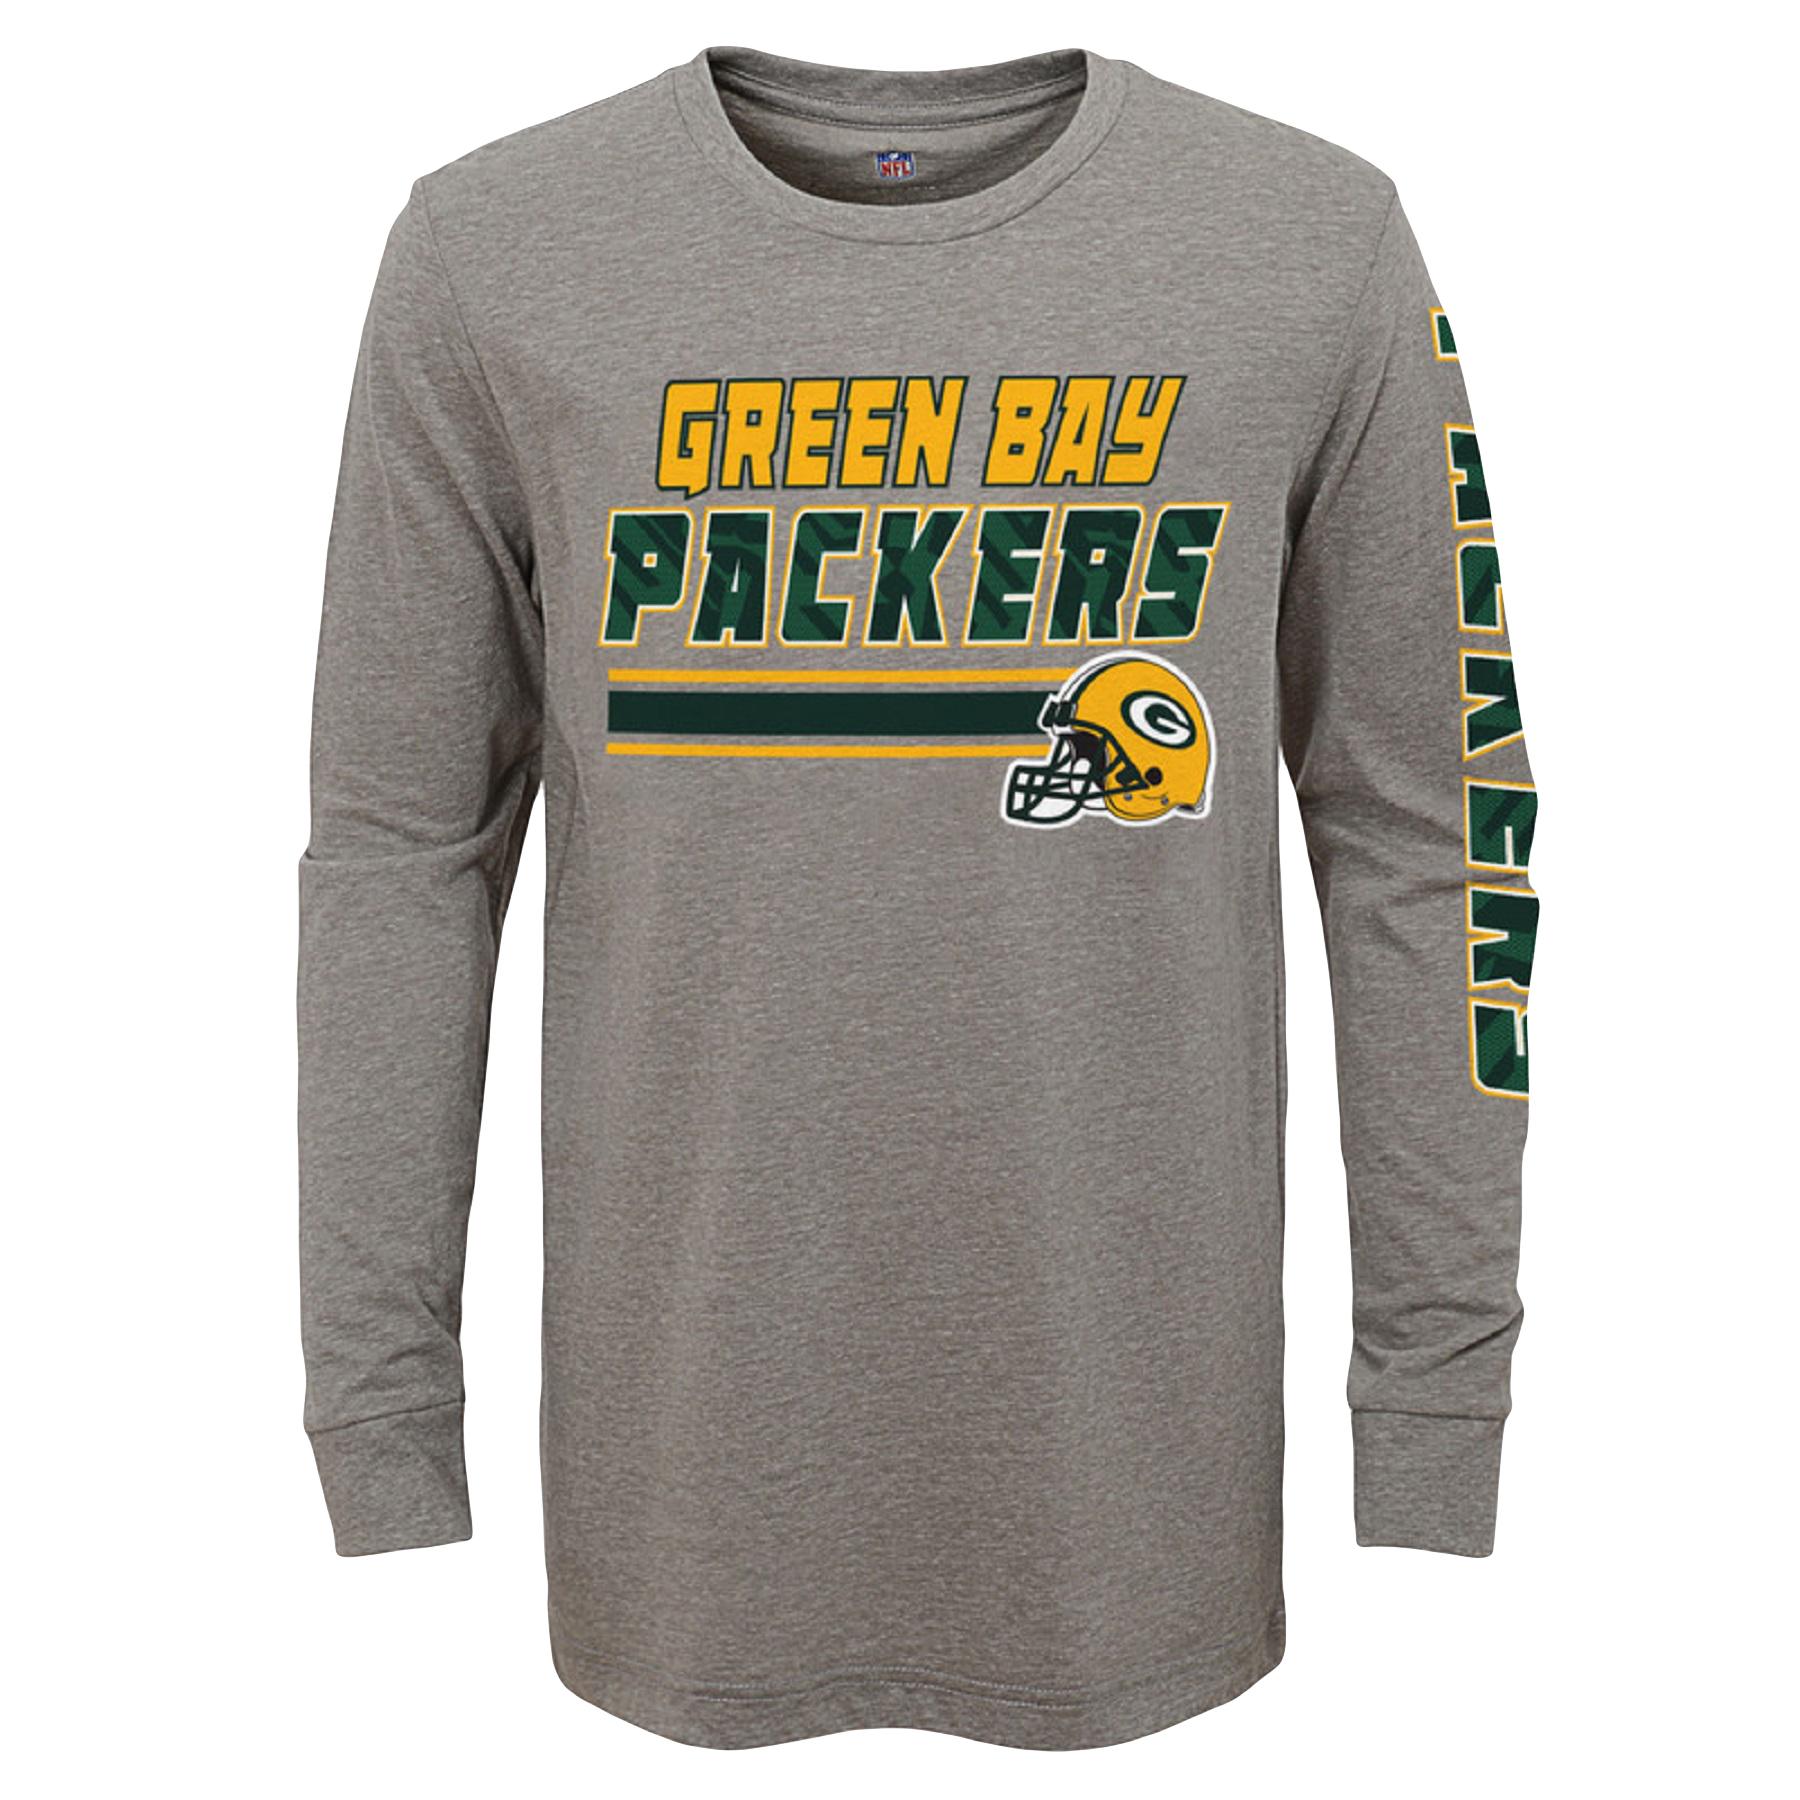 Youth Gray Green Bay Packers Tri-Blend Long Sleeve T-Shirt